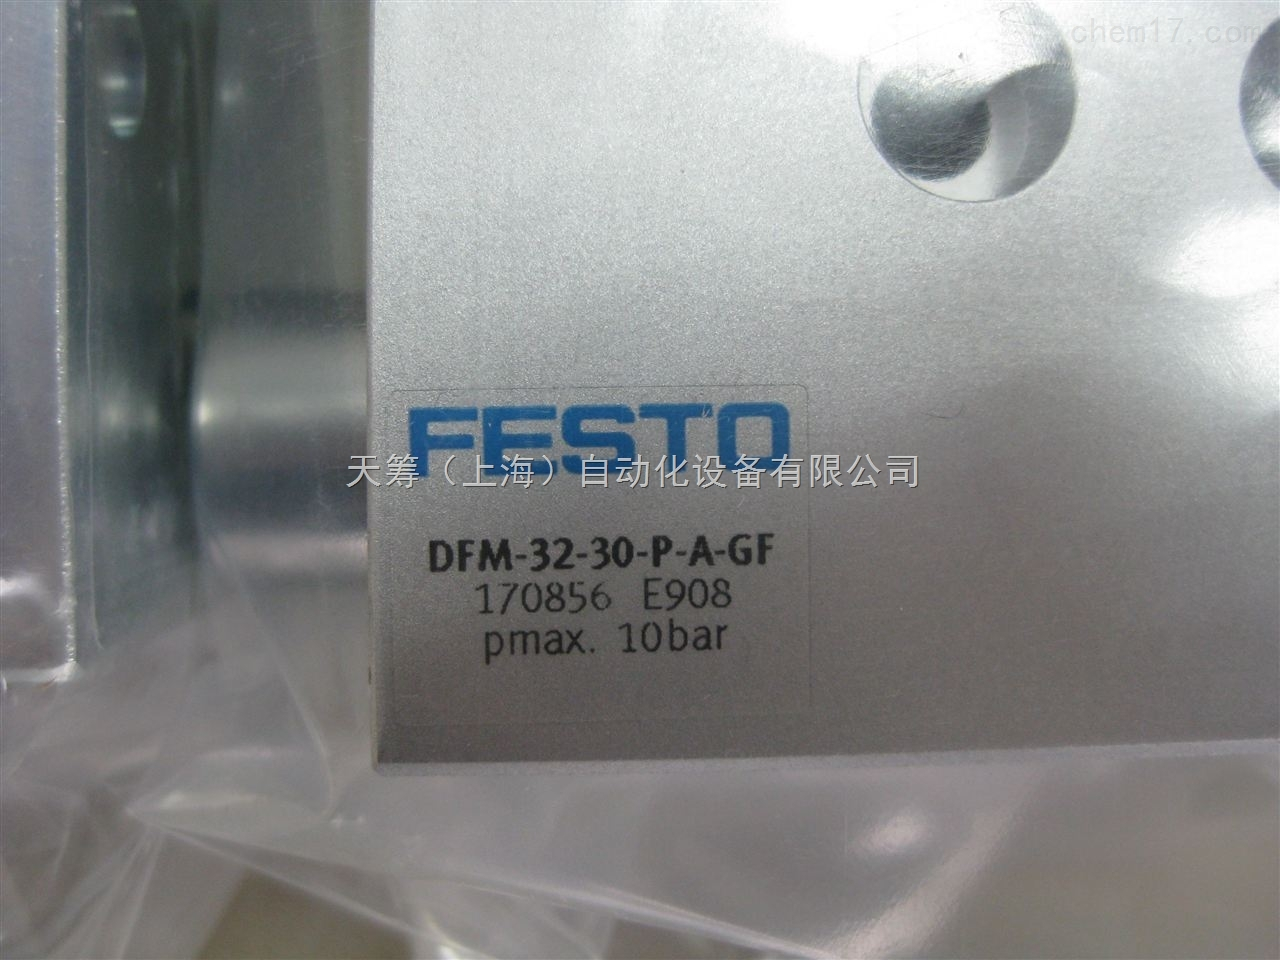 FESTO费斯托DFM系列festo导向气缸DFM-32-30-P-A-GF